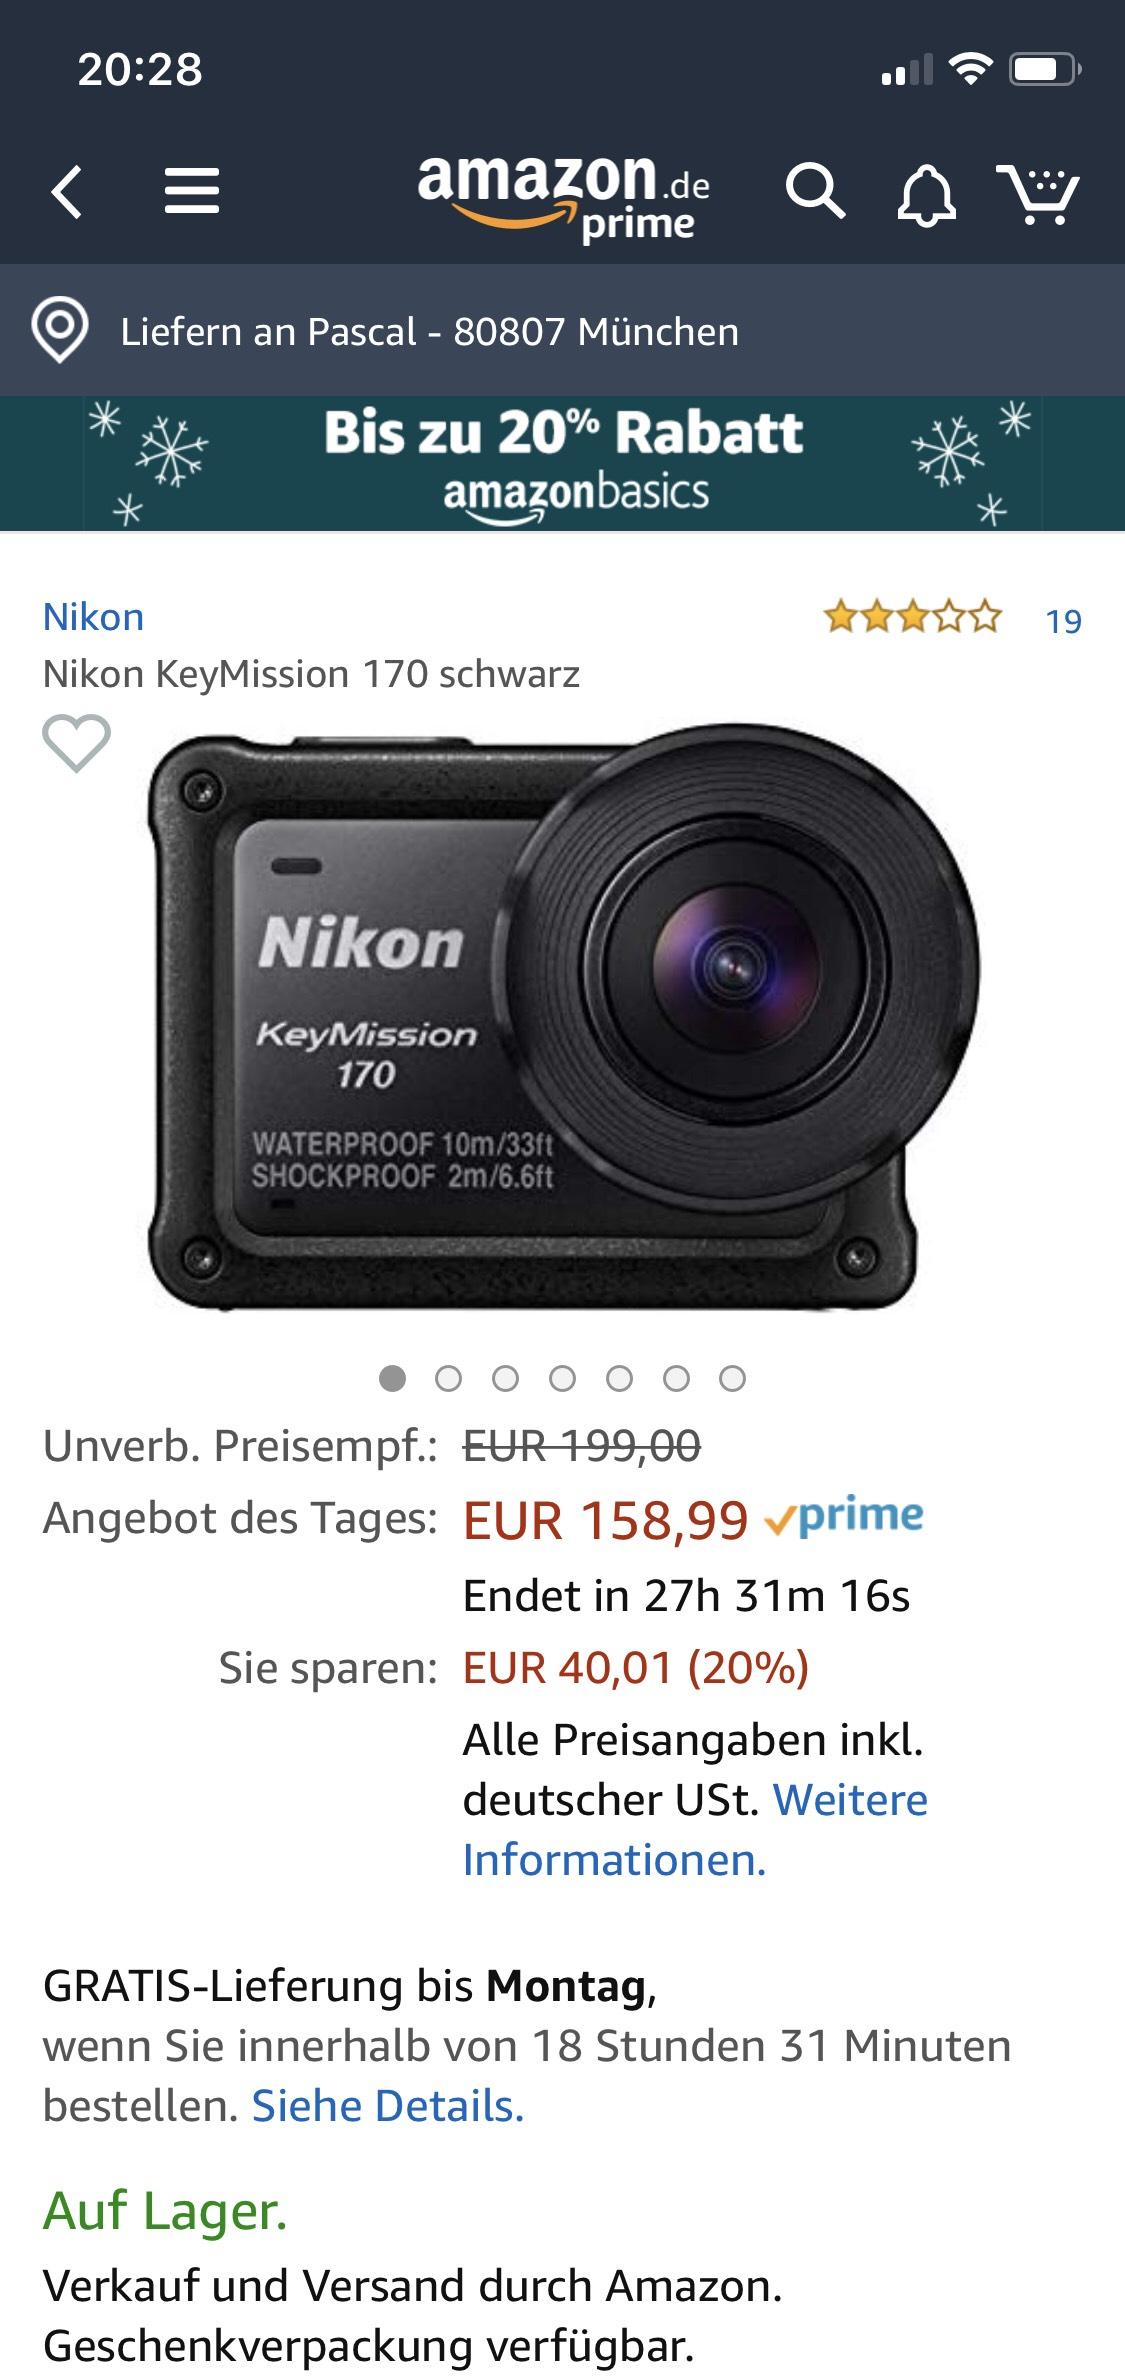 Nikon Key Mission 170